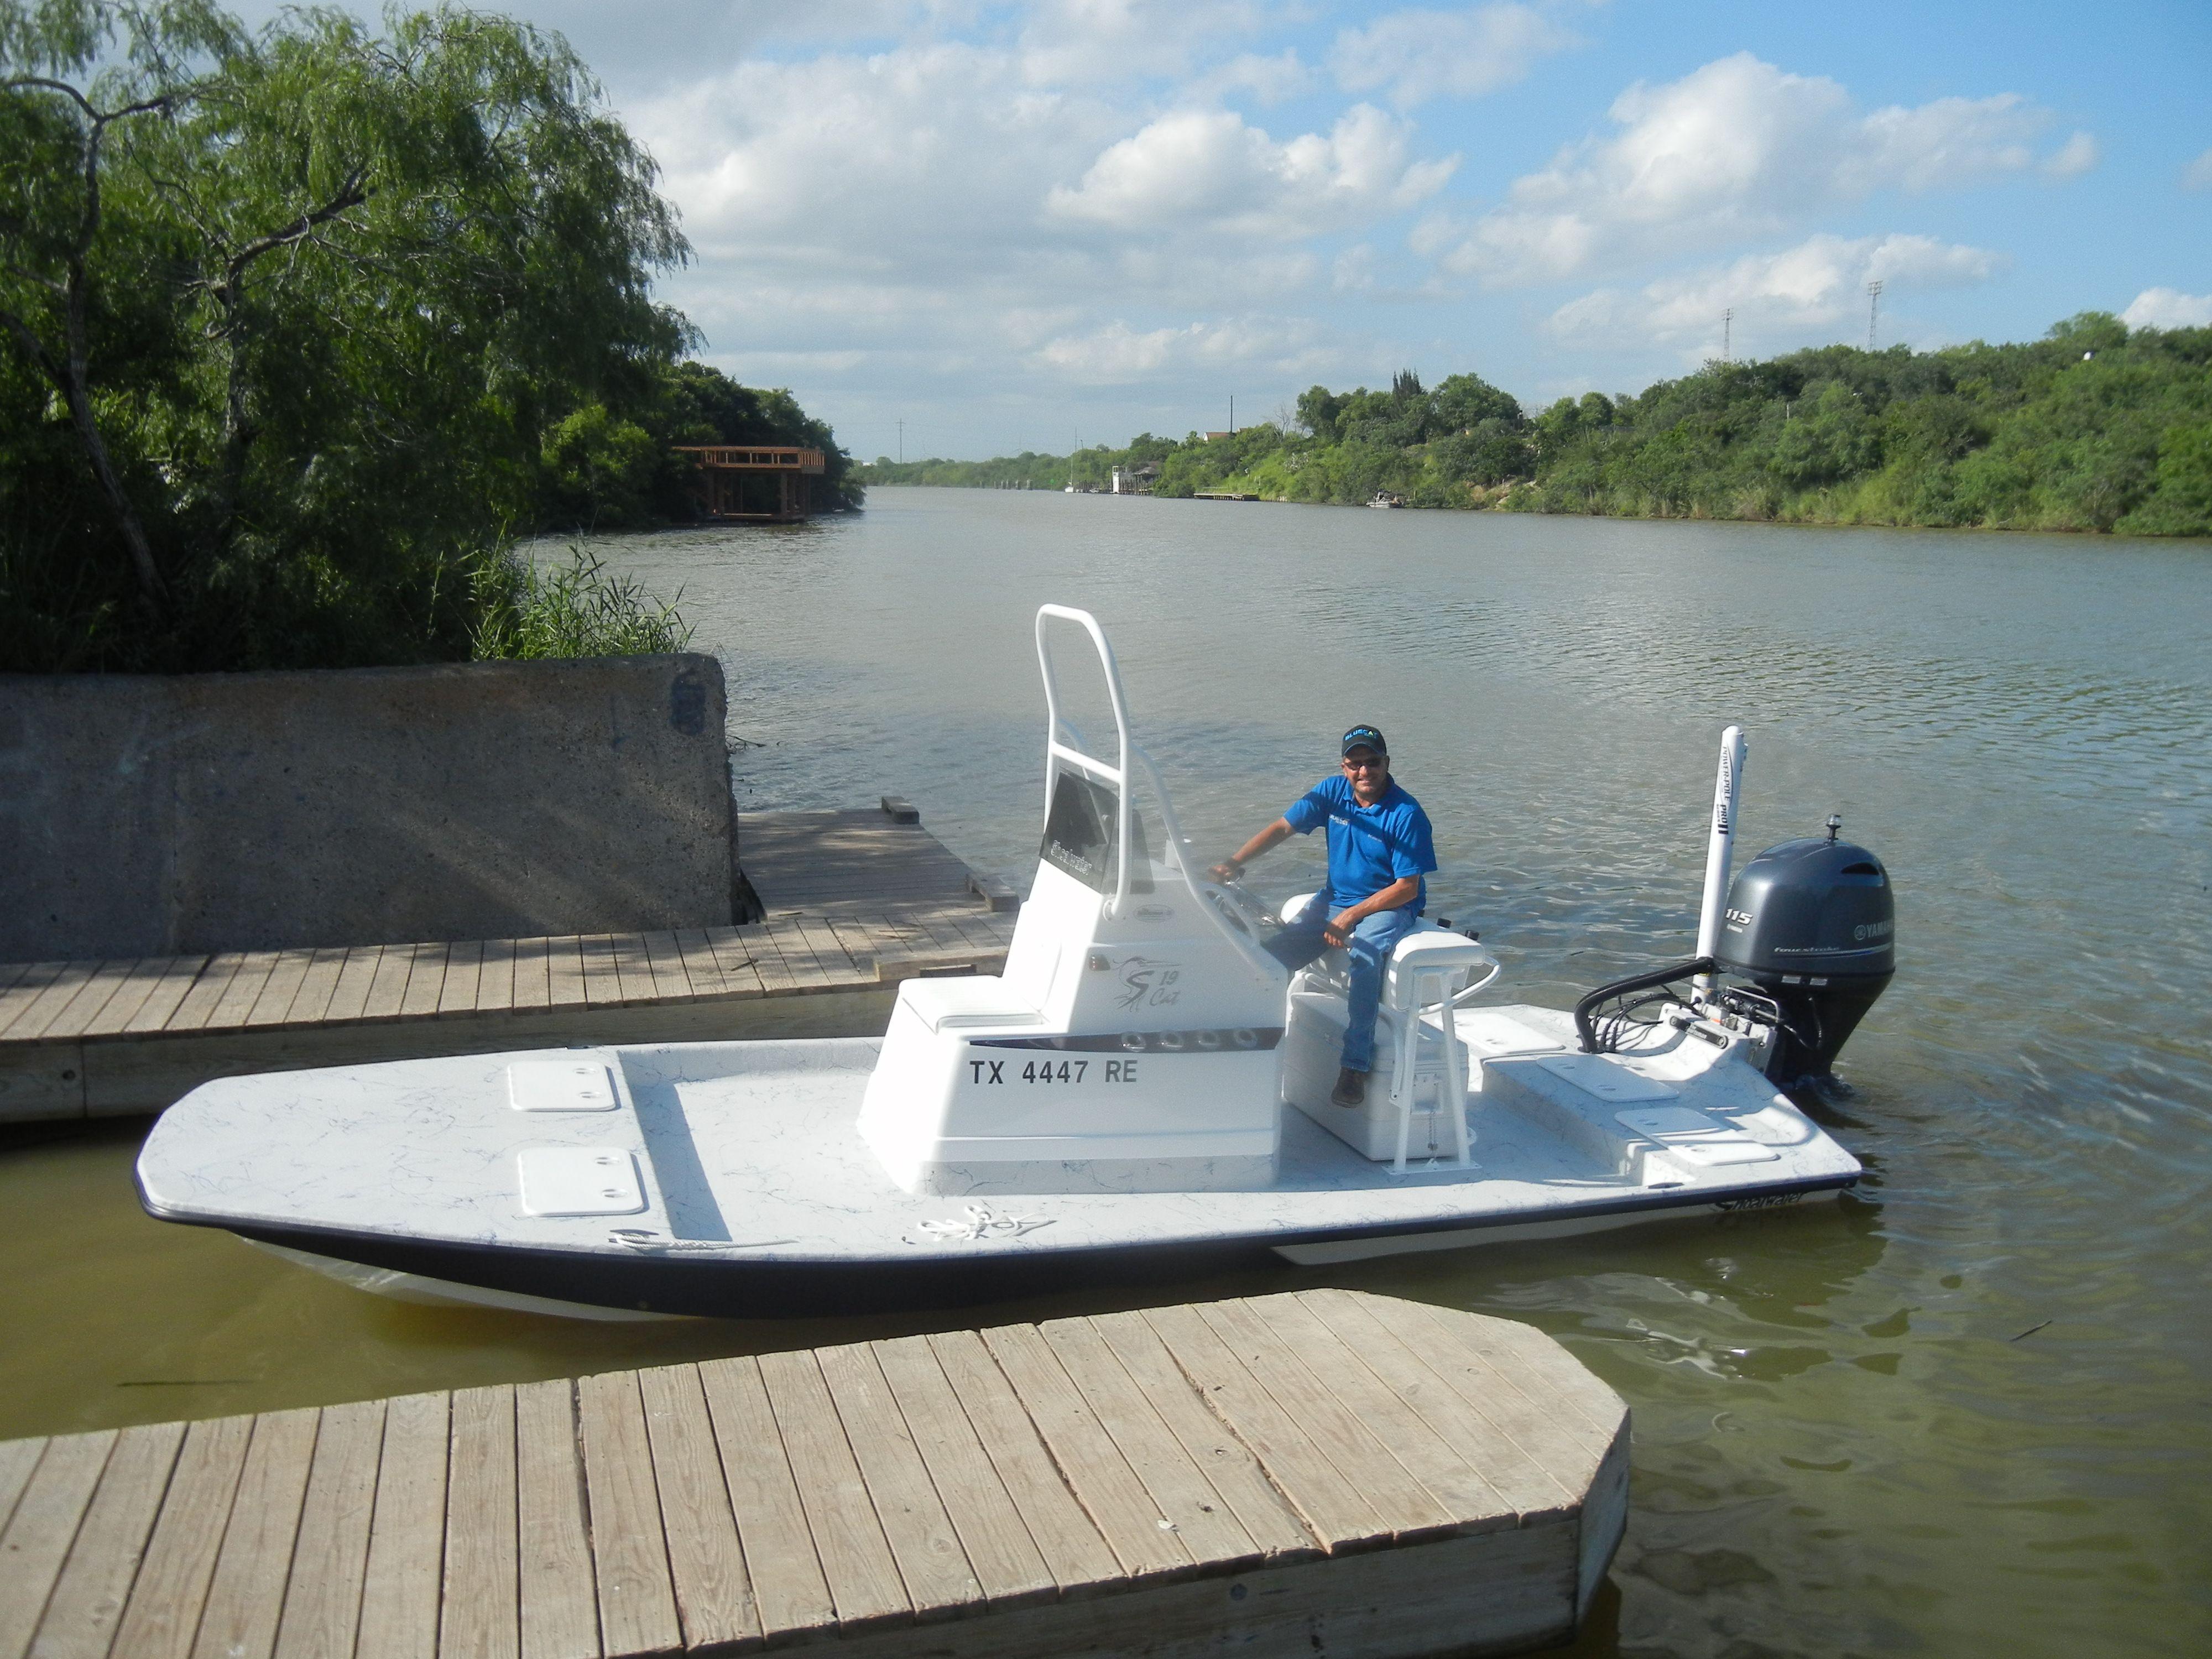 Pin by Jordan Kirkpatrick on Salt water fishing | Fishing Boats, Boat, Bay Boats